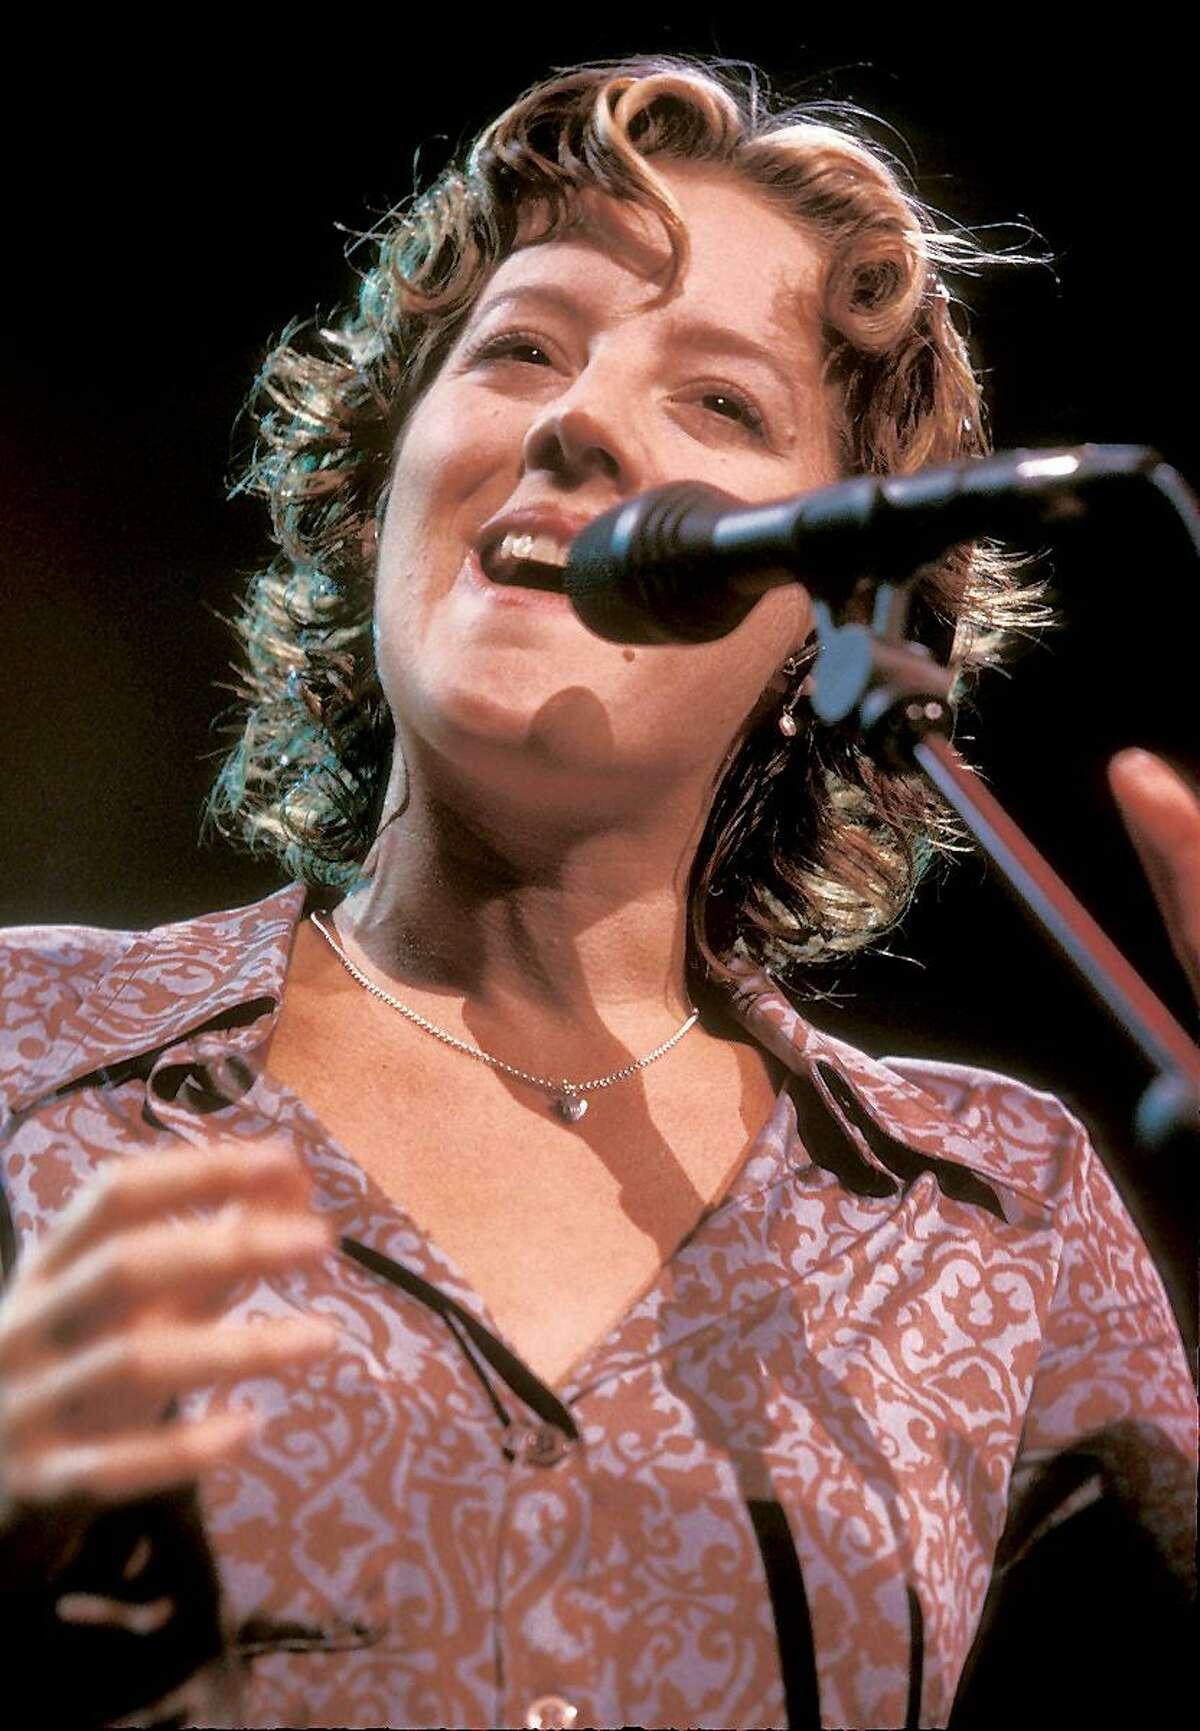 Sara McLachlan is set to play the Comcast Theater in Hartford on Aug. 1. (John Atashian